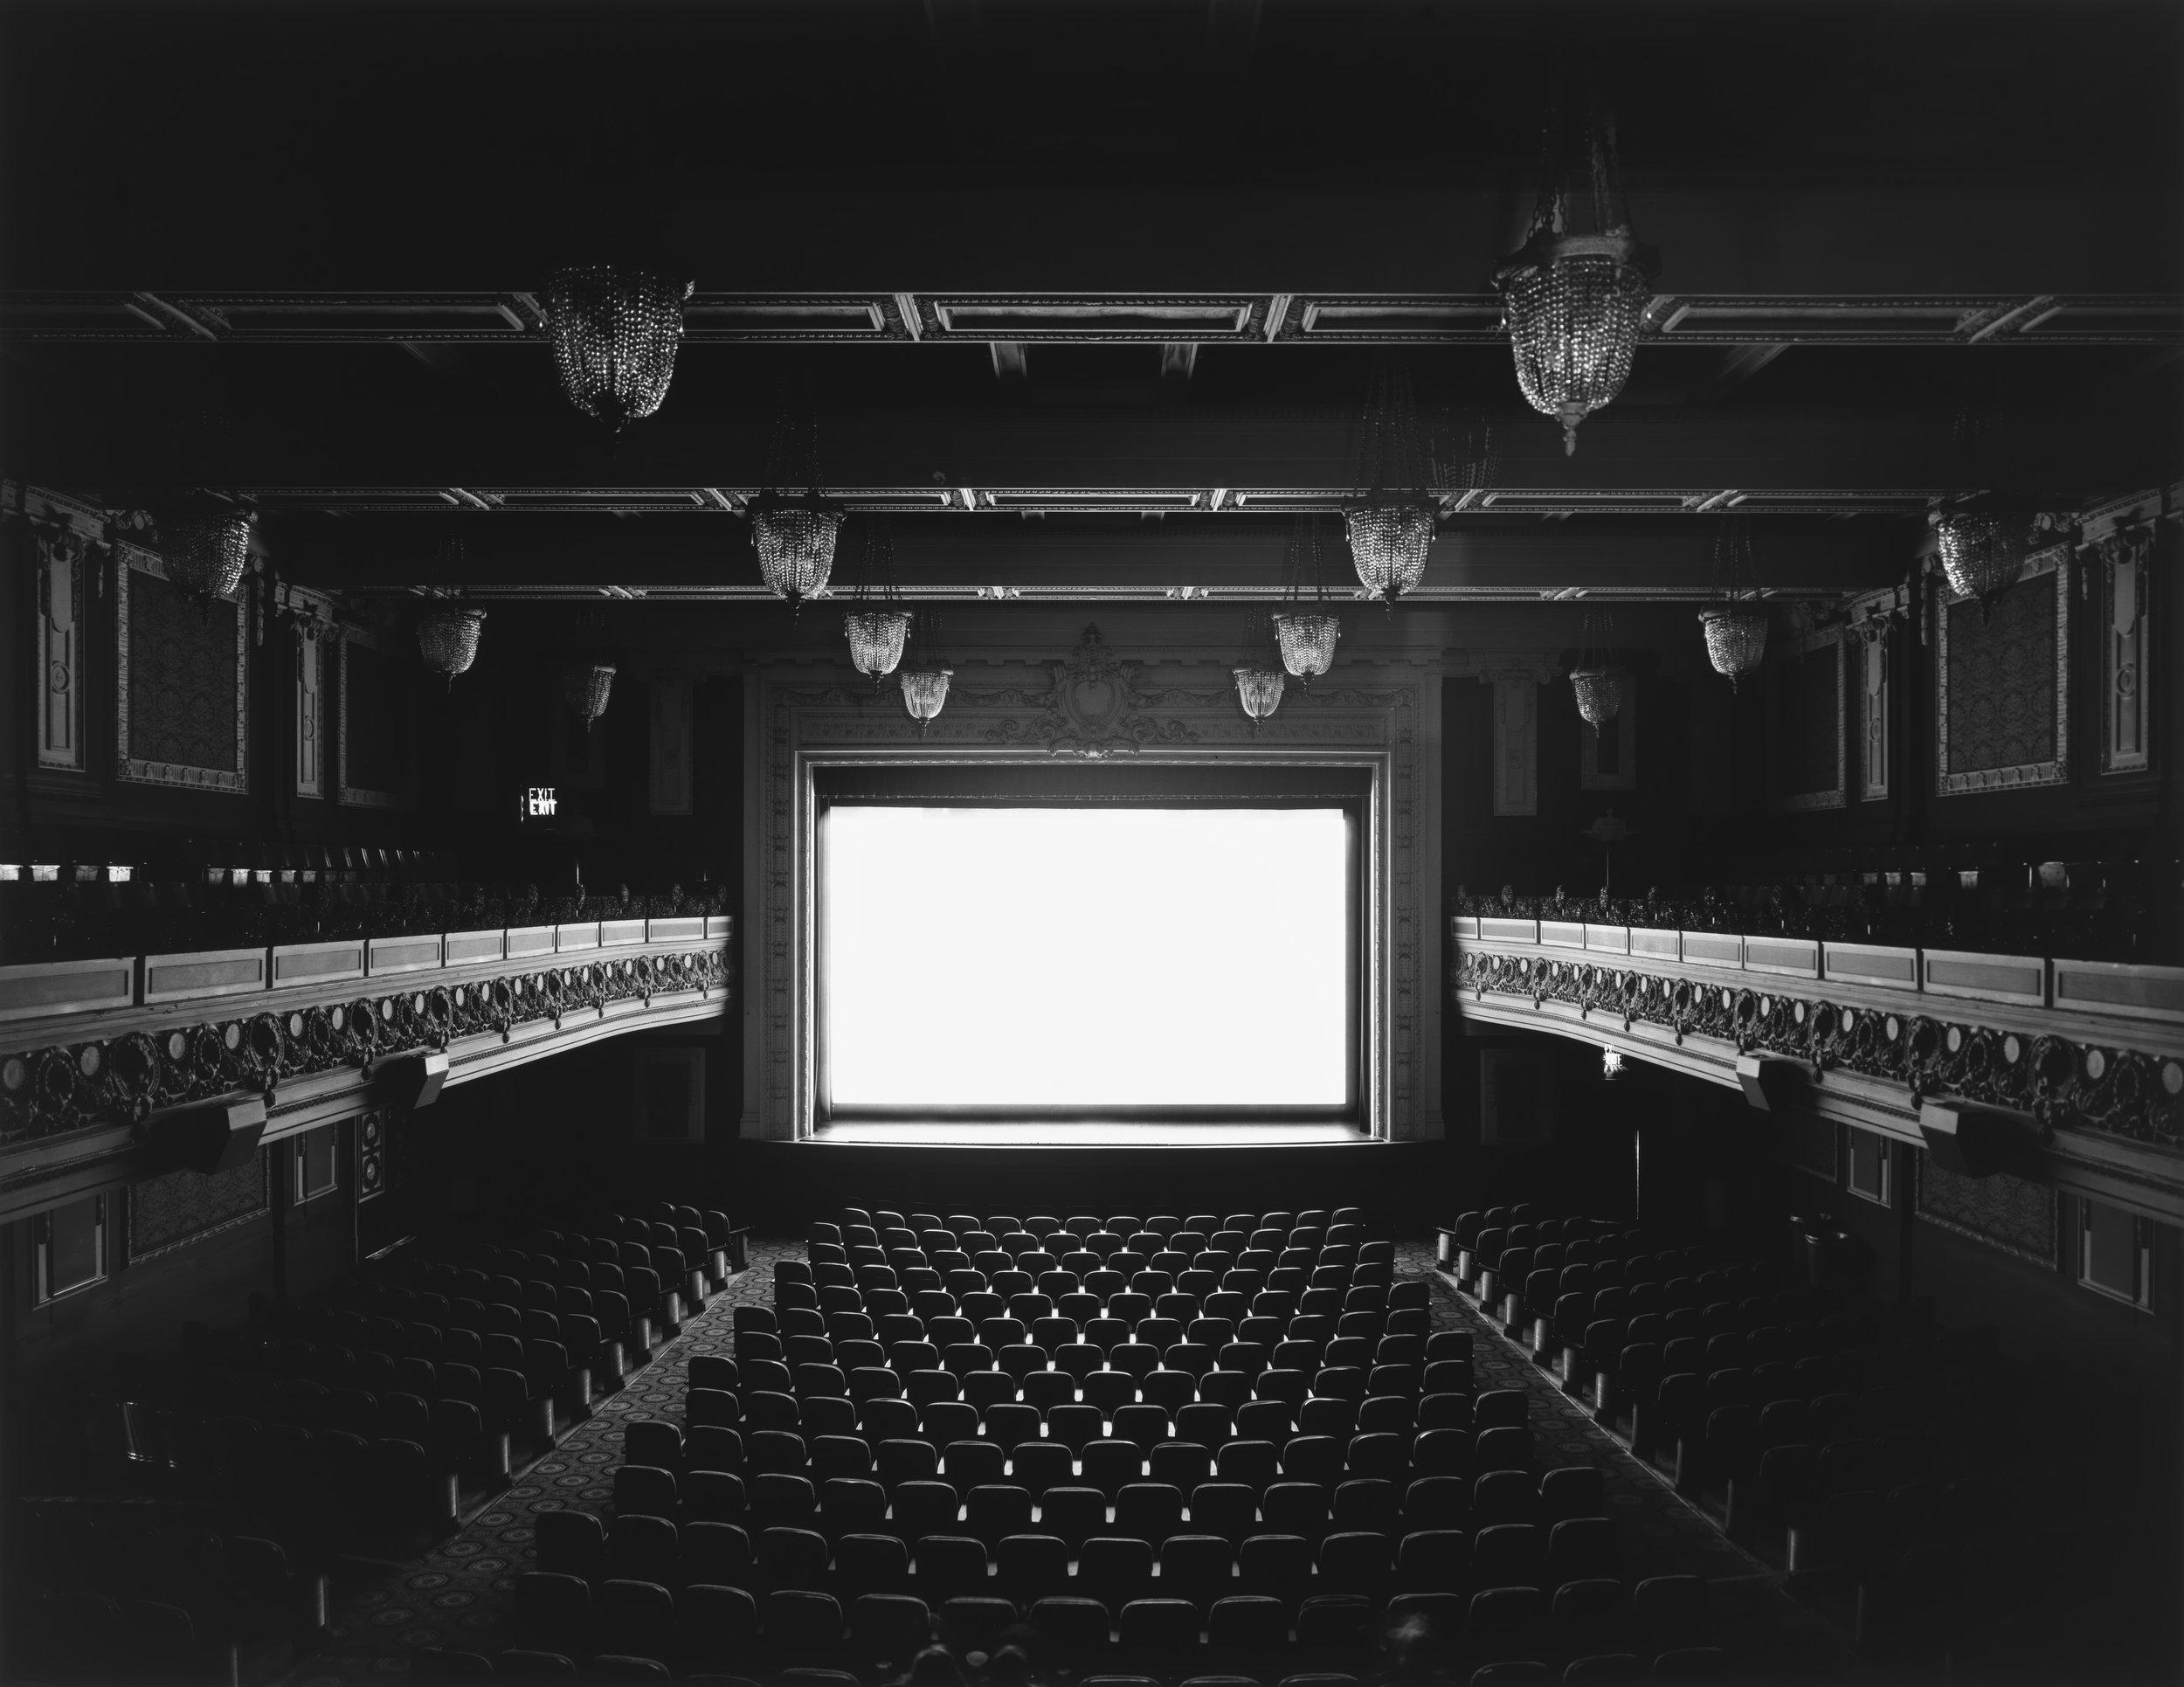 © Theaters by Hiroshi Sugimoto,Regency, San Francisco, 1992